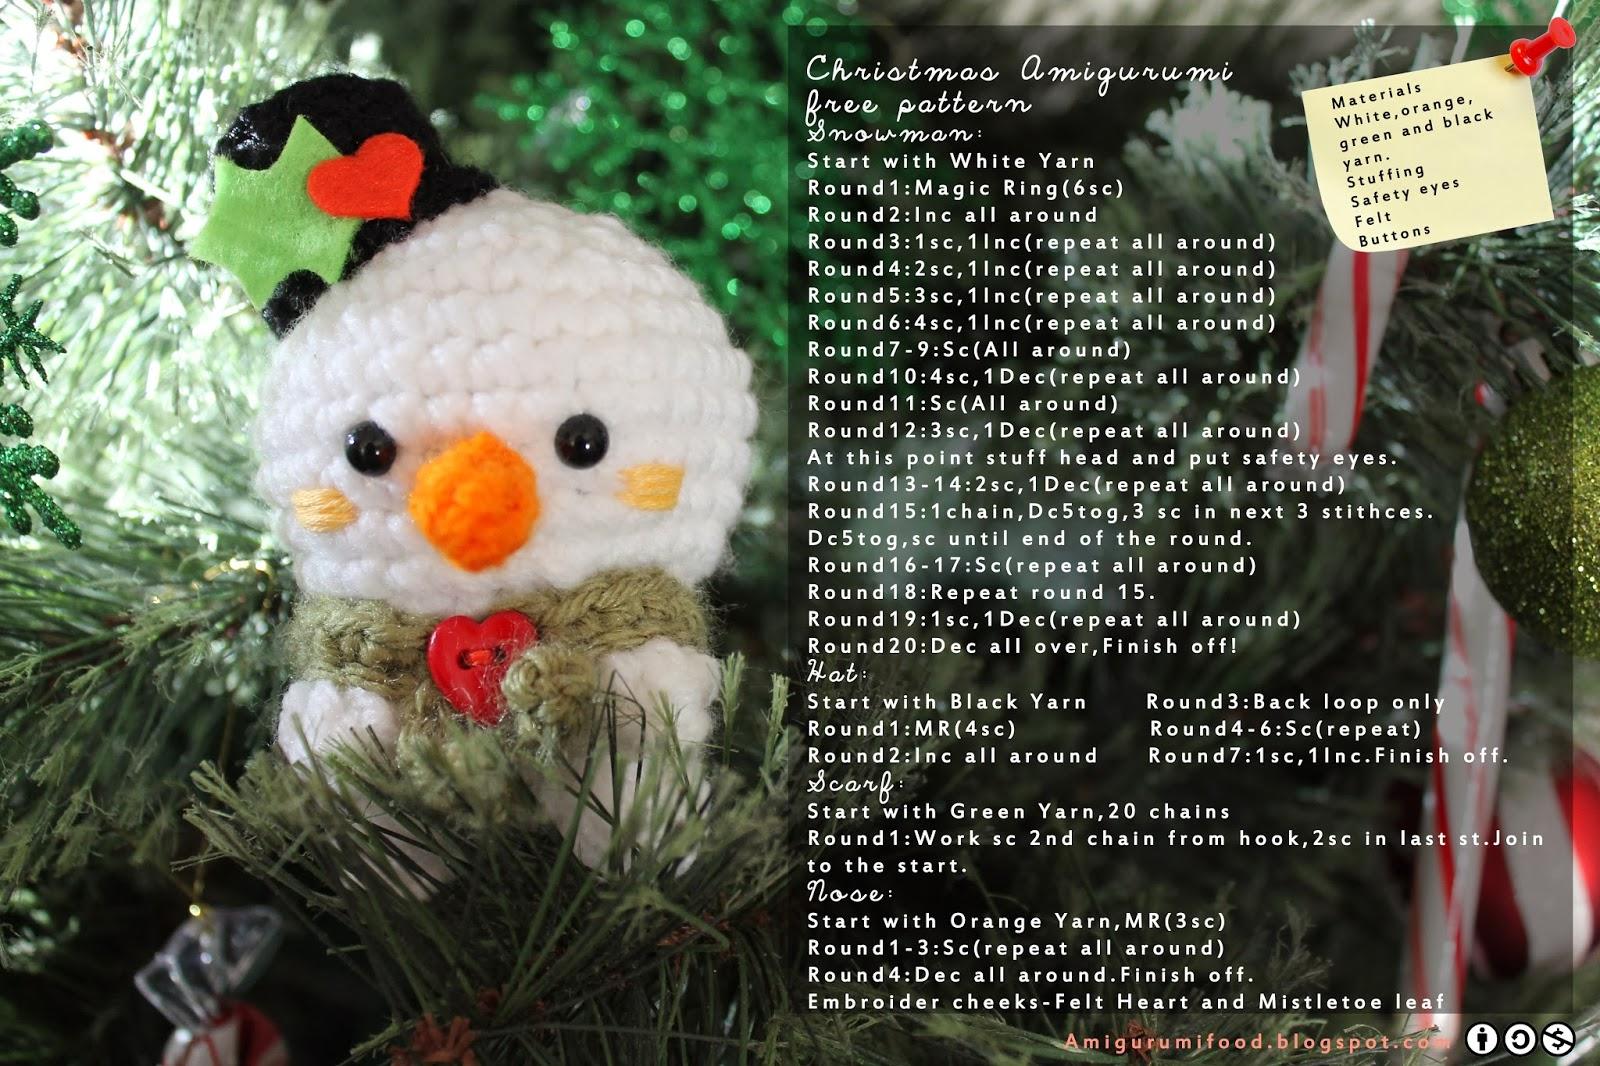 Free Holiday Amigurumi Patterns : Amigurumi Food: Christmas Amigurumi Free Pattern!